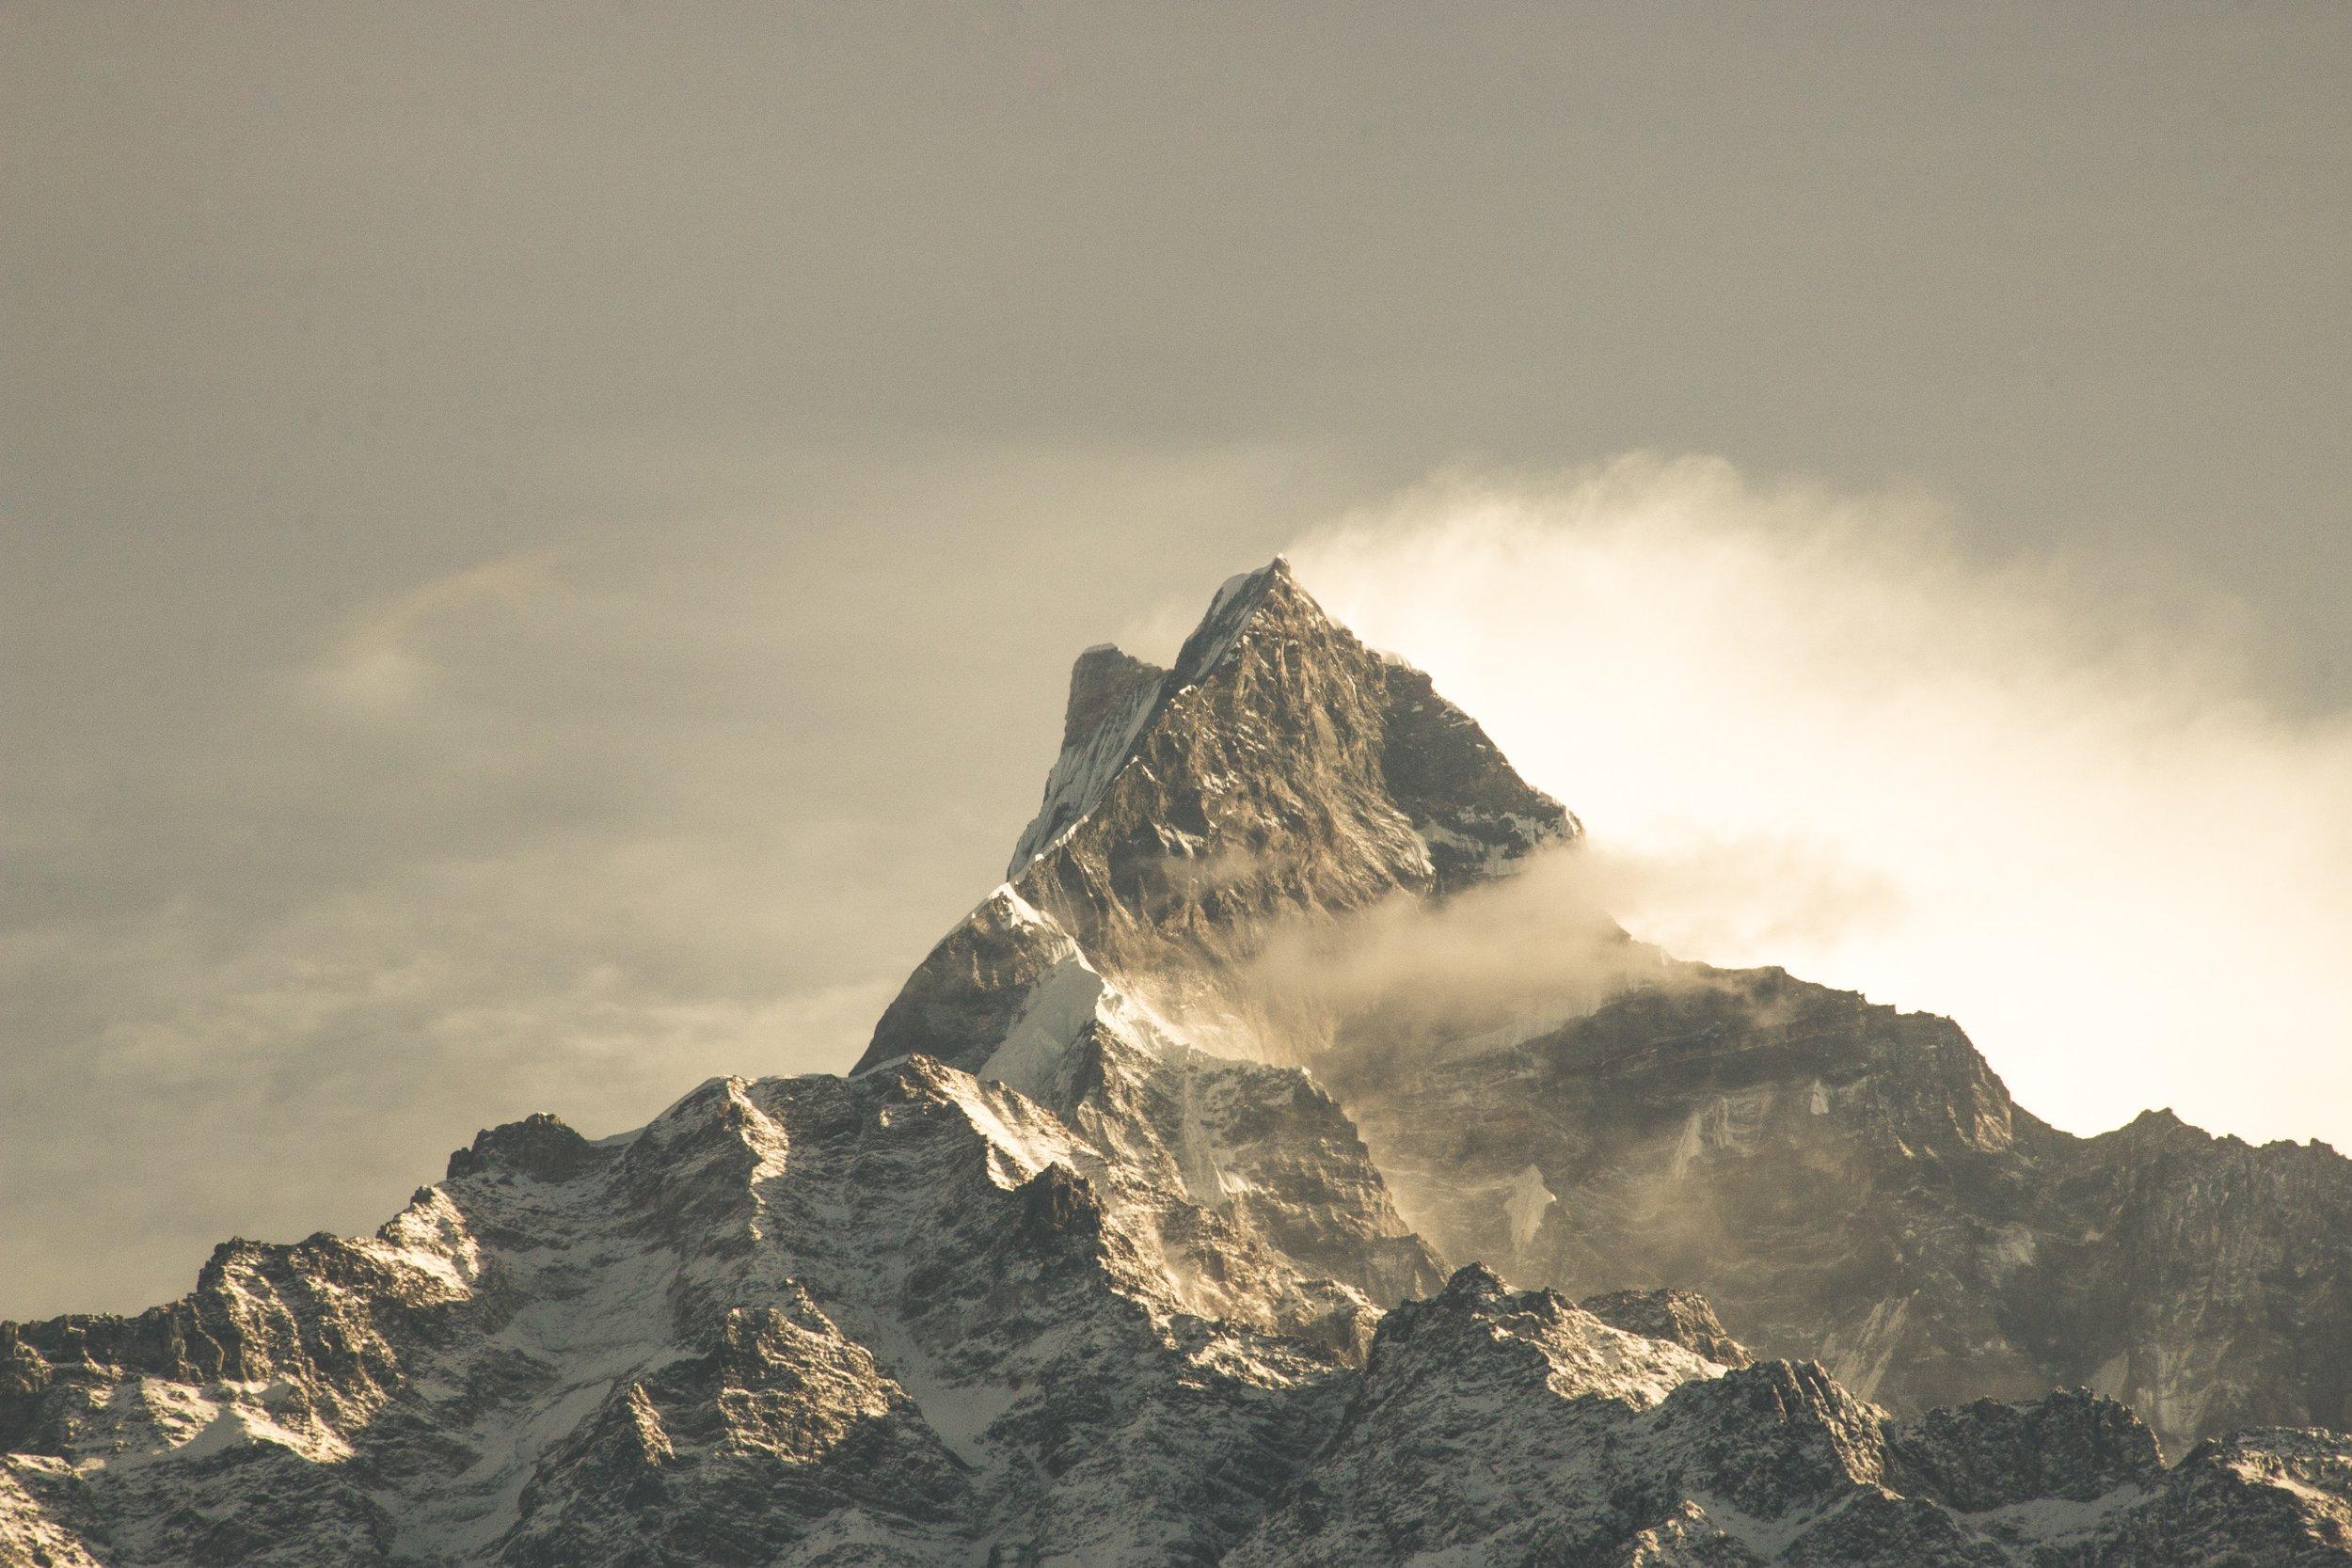 fog-foggy-landscape-897717.jpg